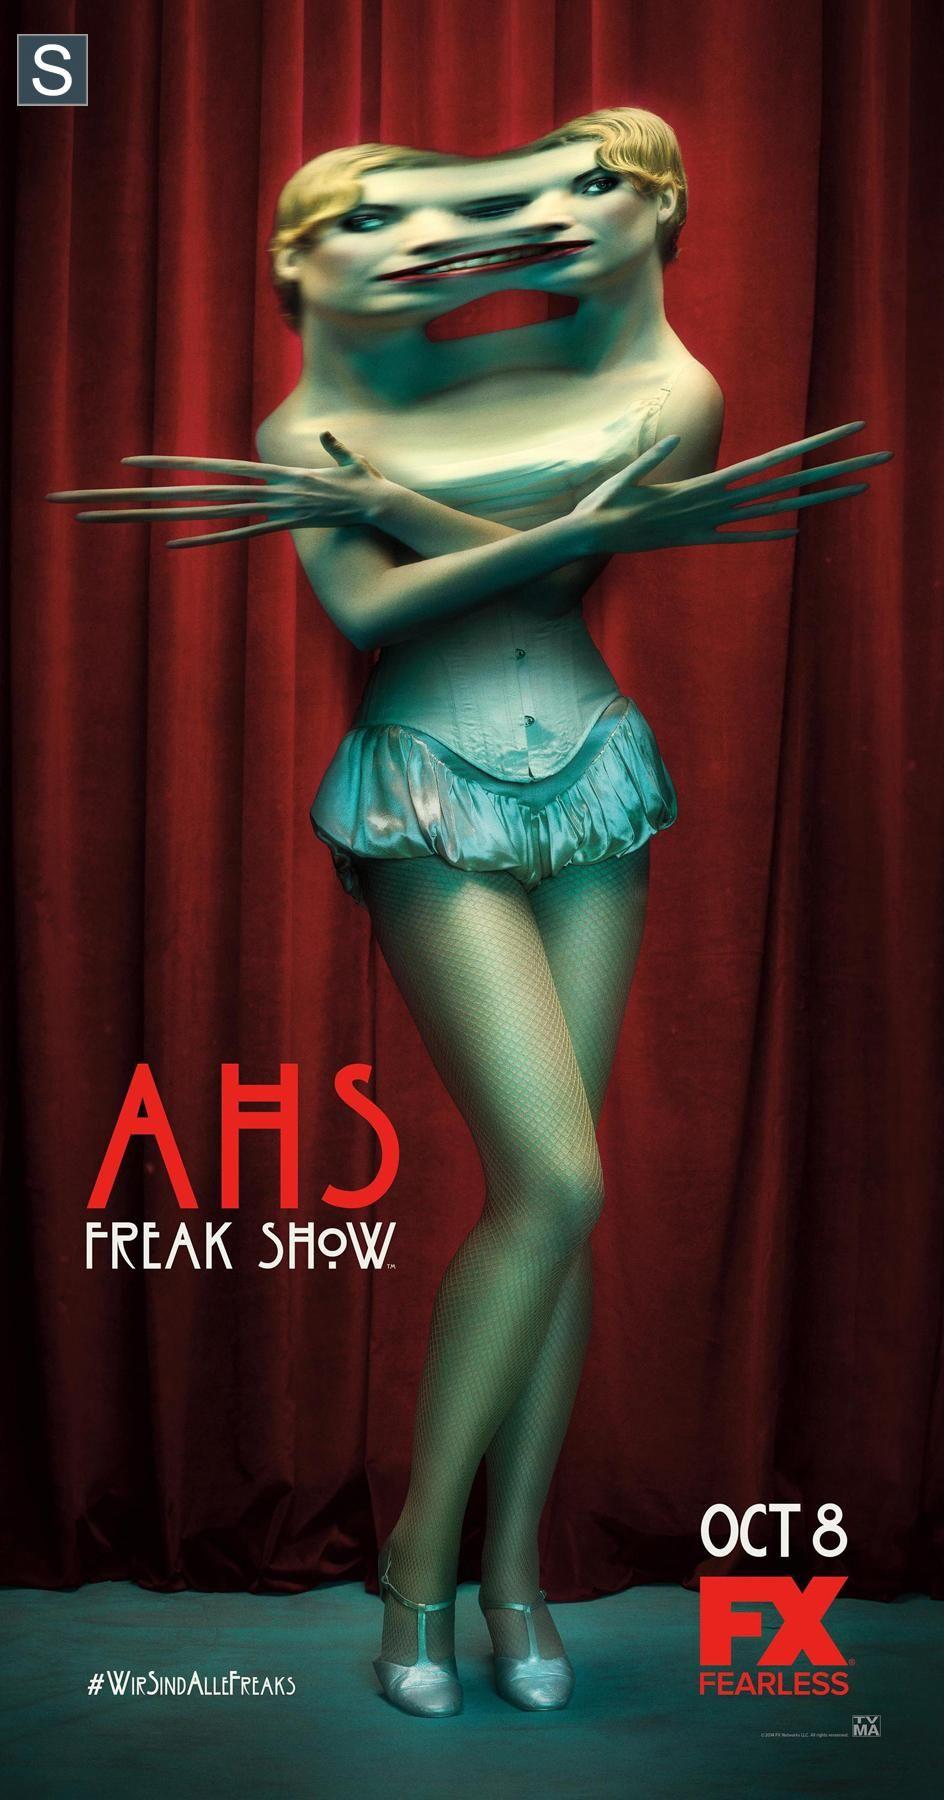 Ahsfans American Horror Pinterest Ahs American Horror And Fans